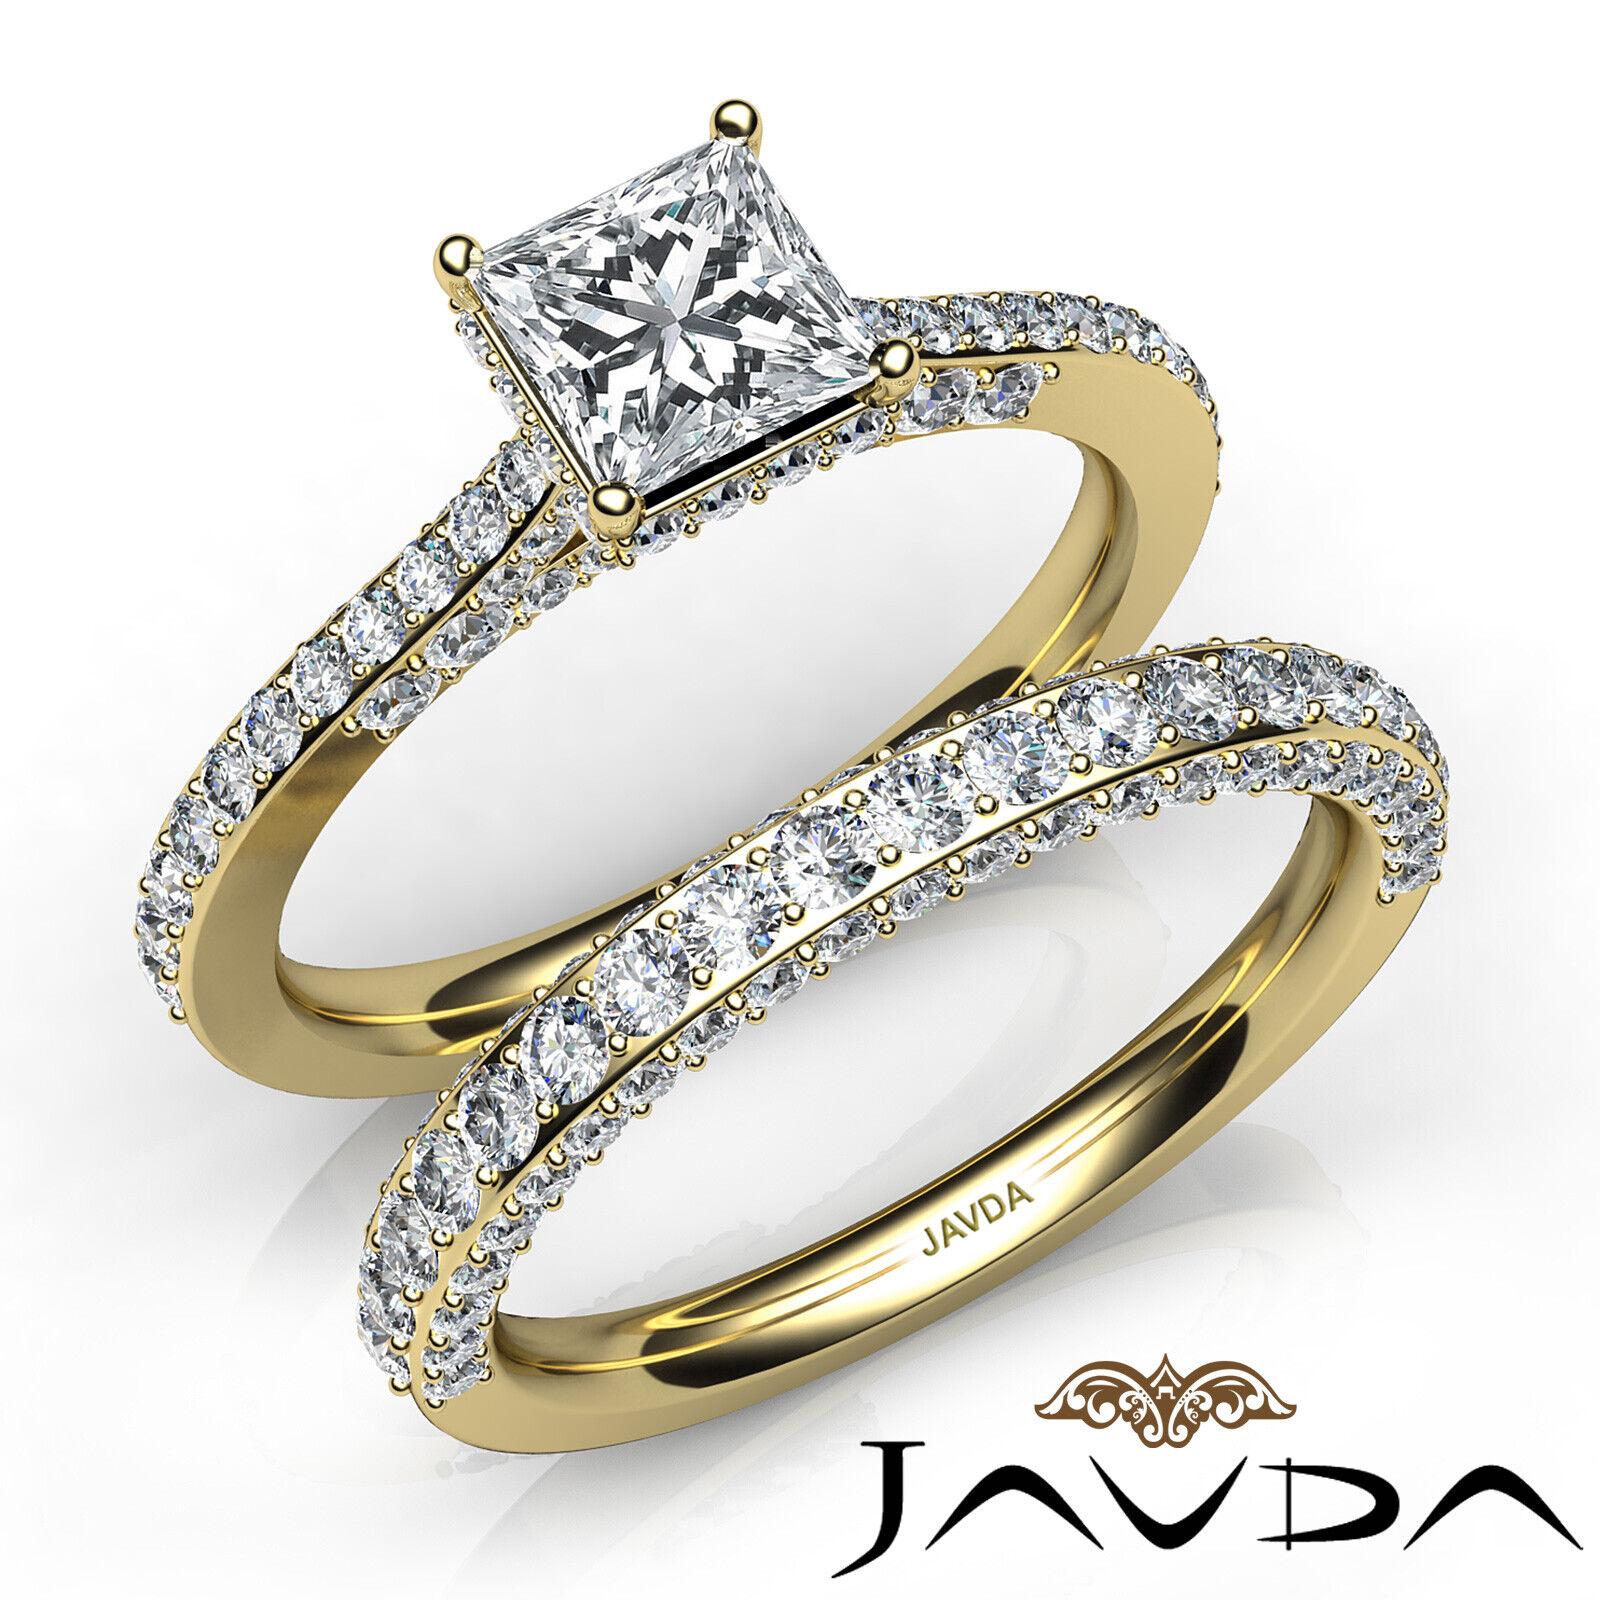 2.35ctw Circa Halo Pave Wedding Set Princess Diamond Engagement Ring GIA G-VVS1 8